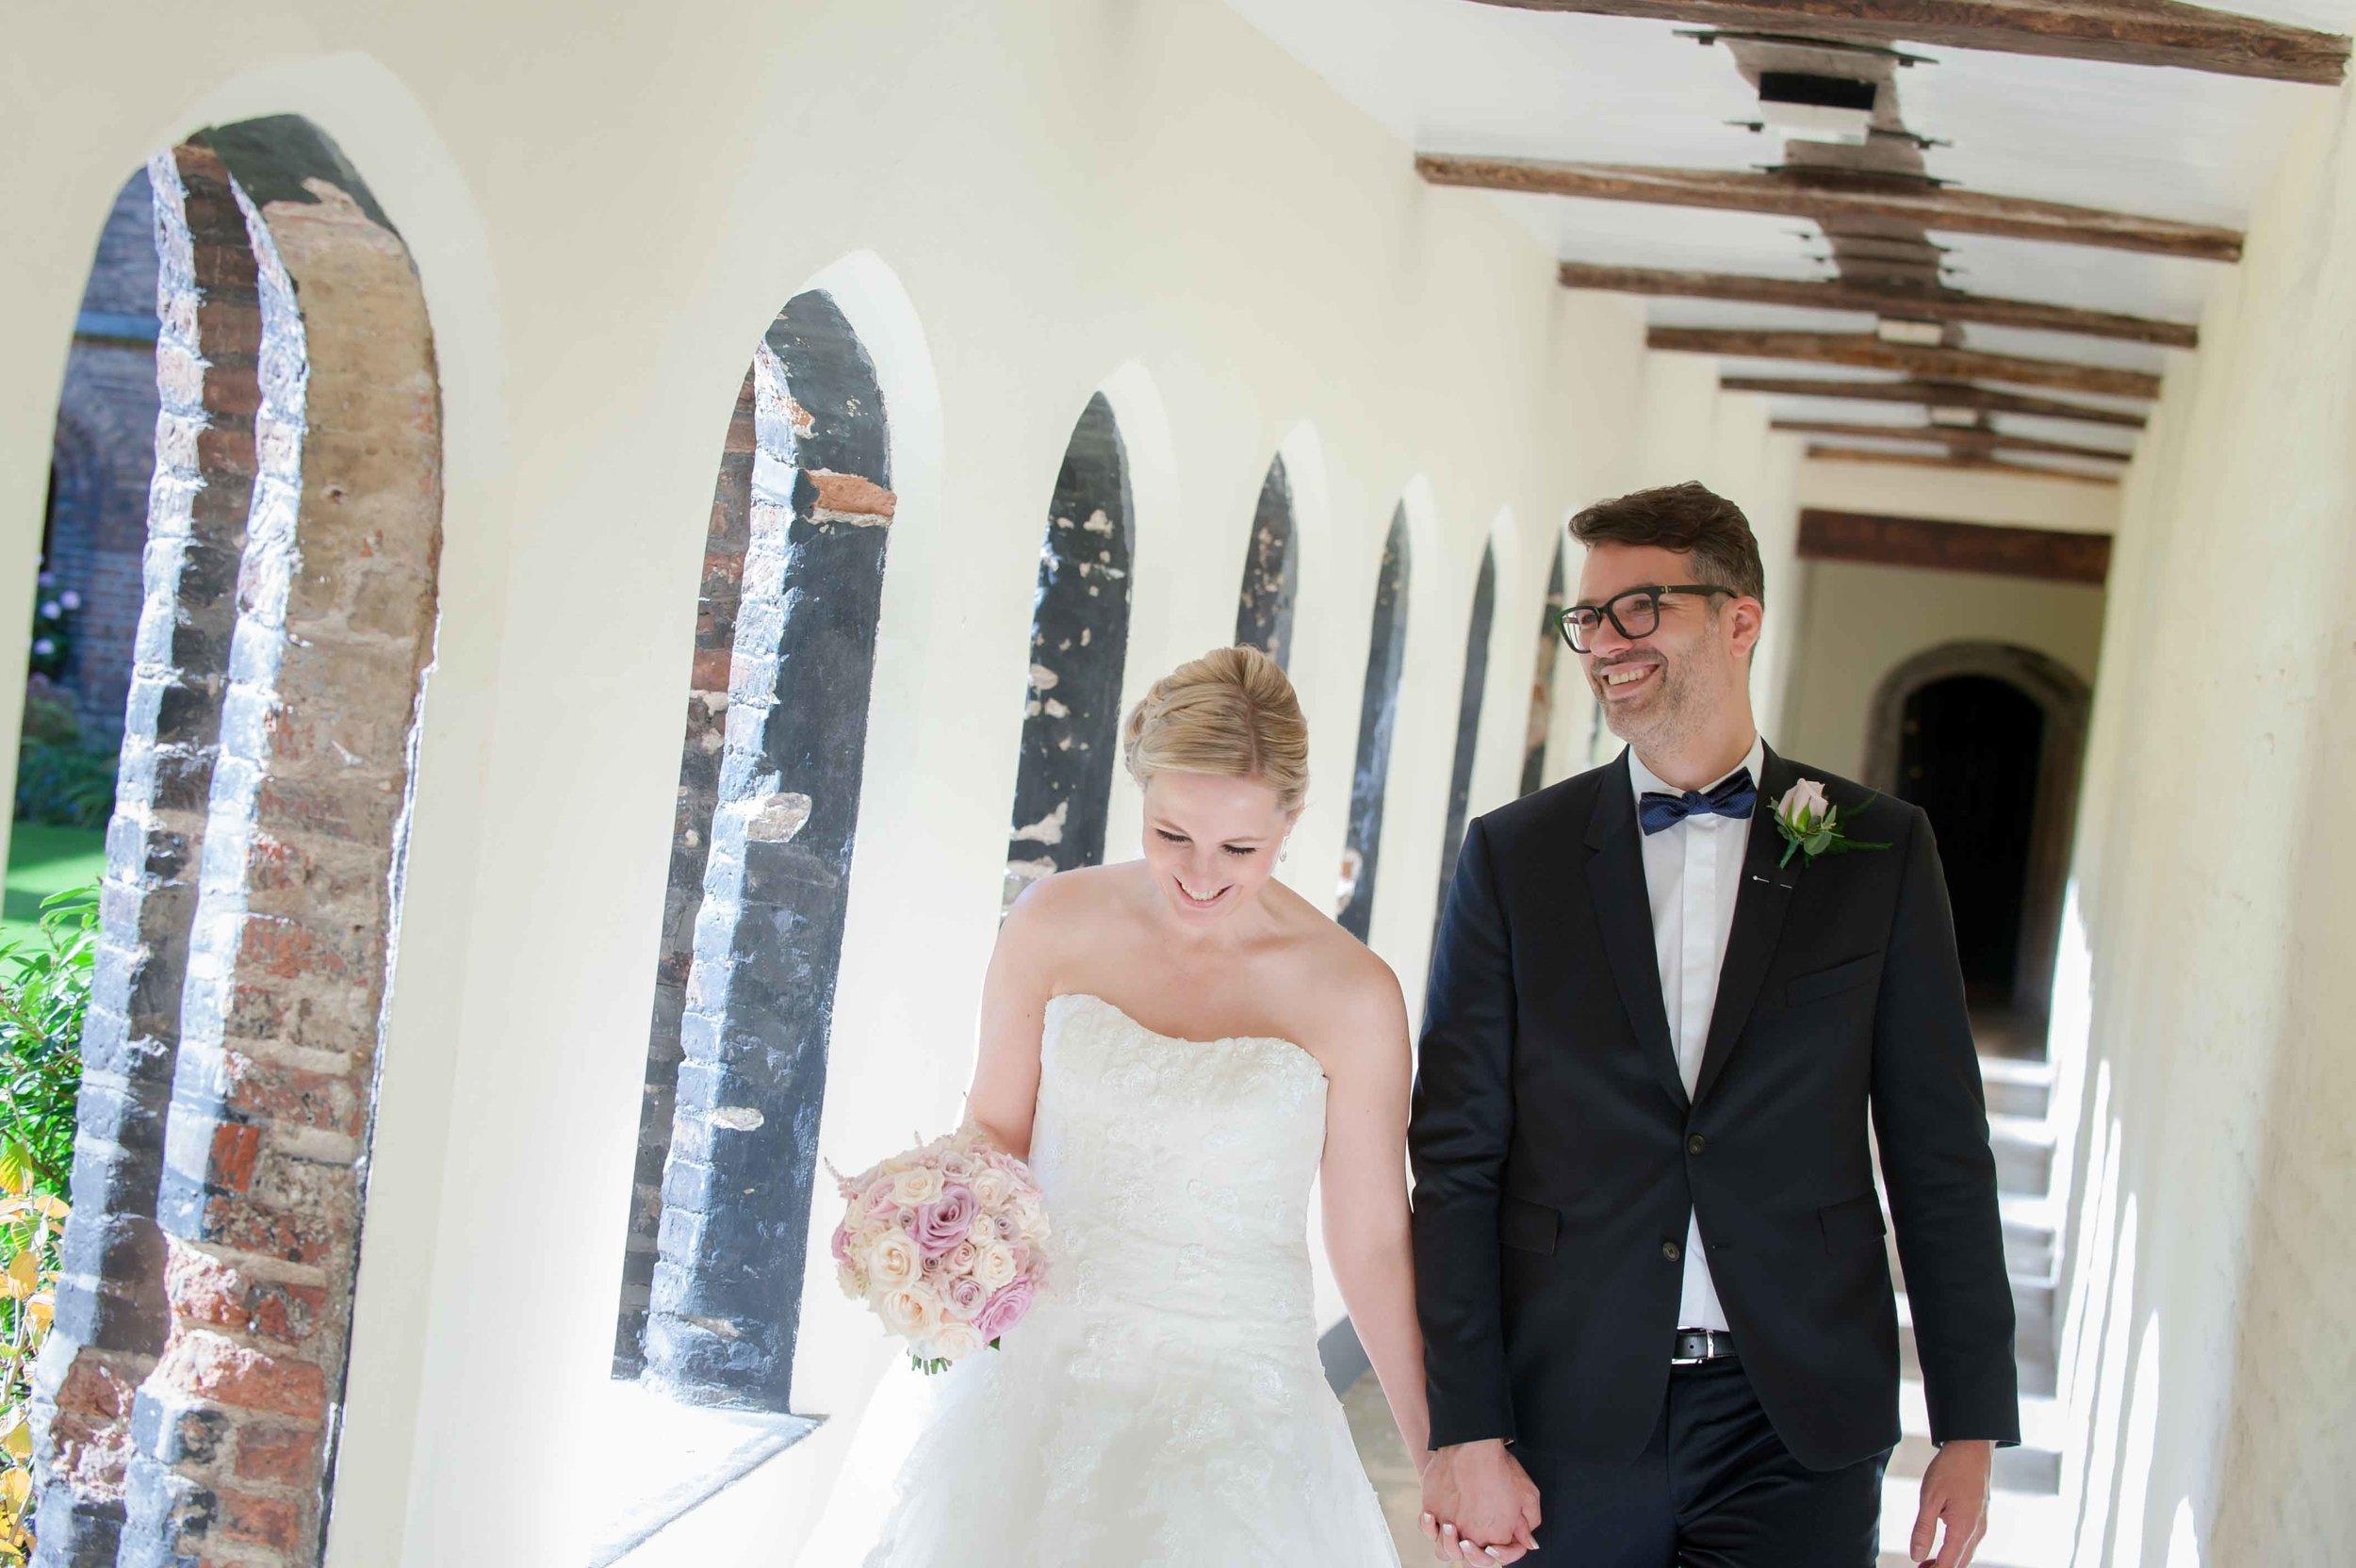 Adrian_Nicole_Charnwood_Weddings_Queens_College_Cambridge-1031.jpg